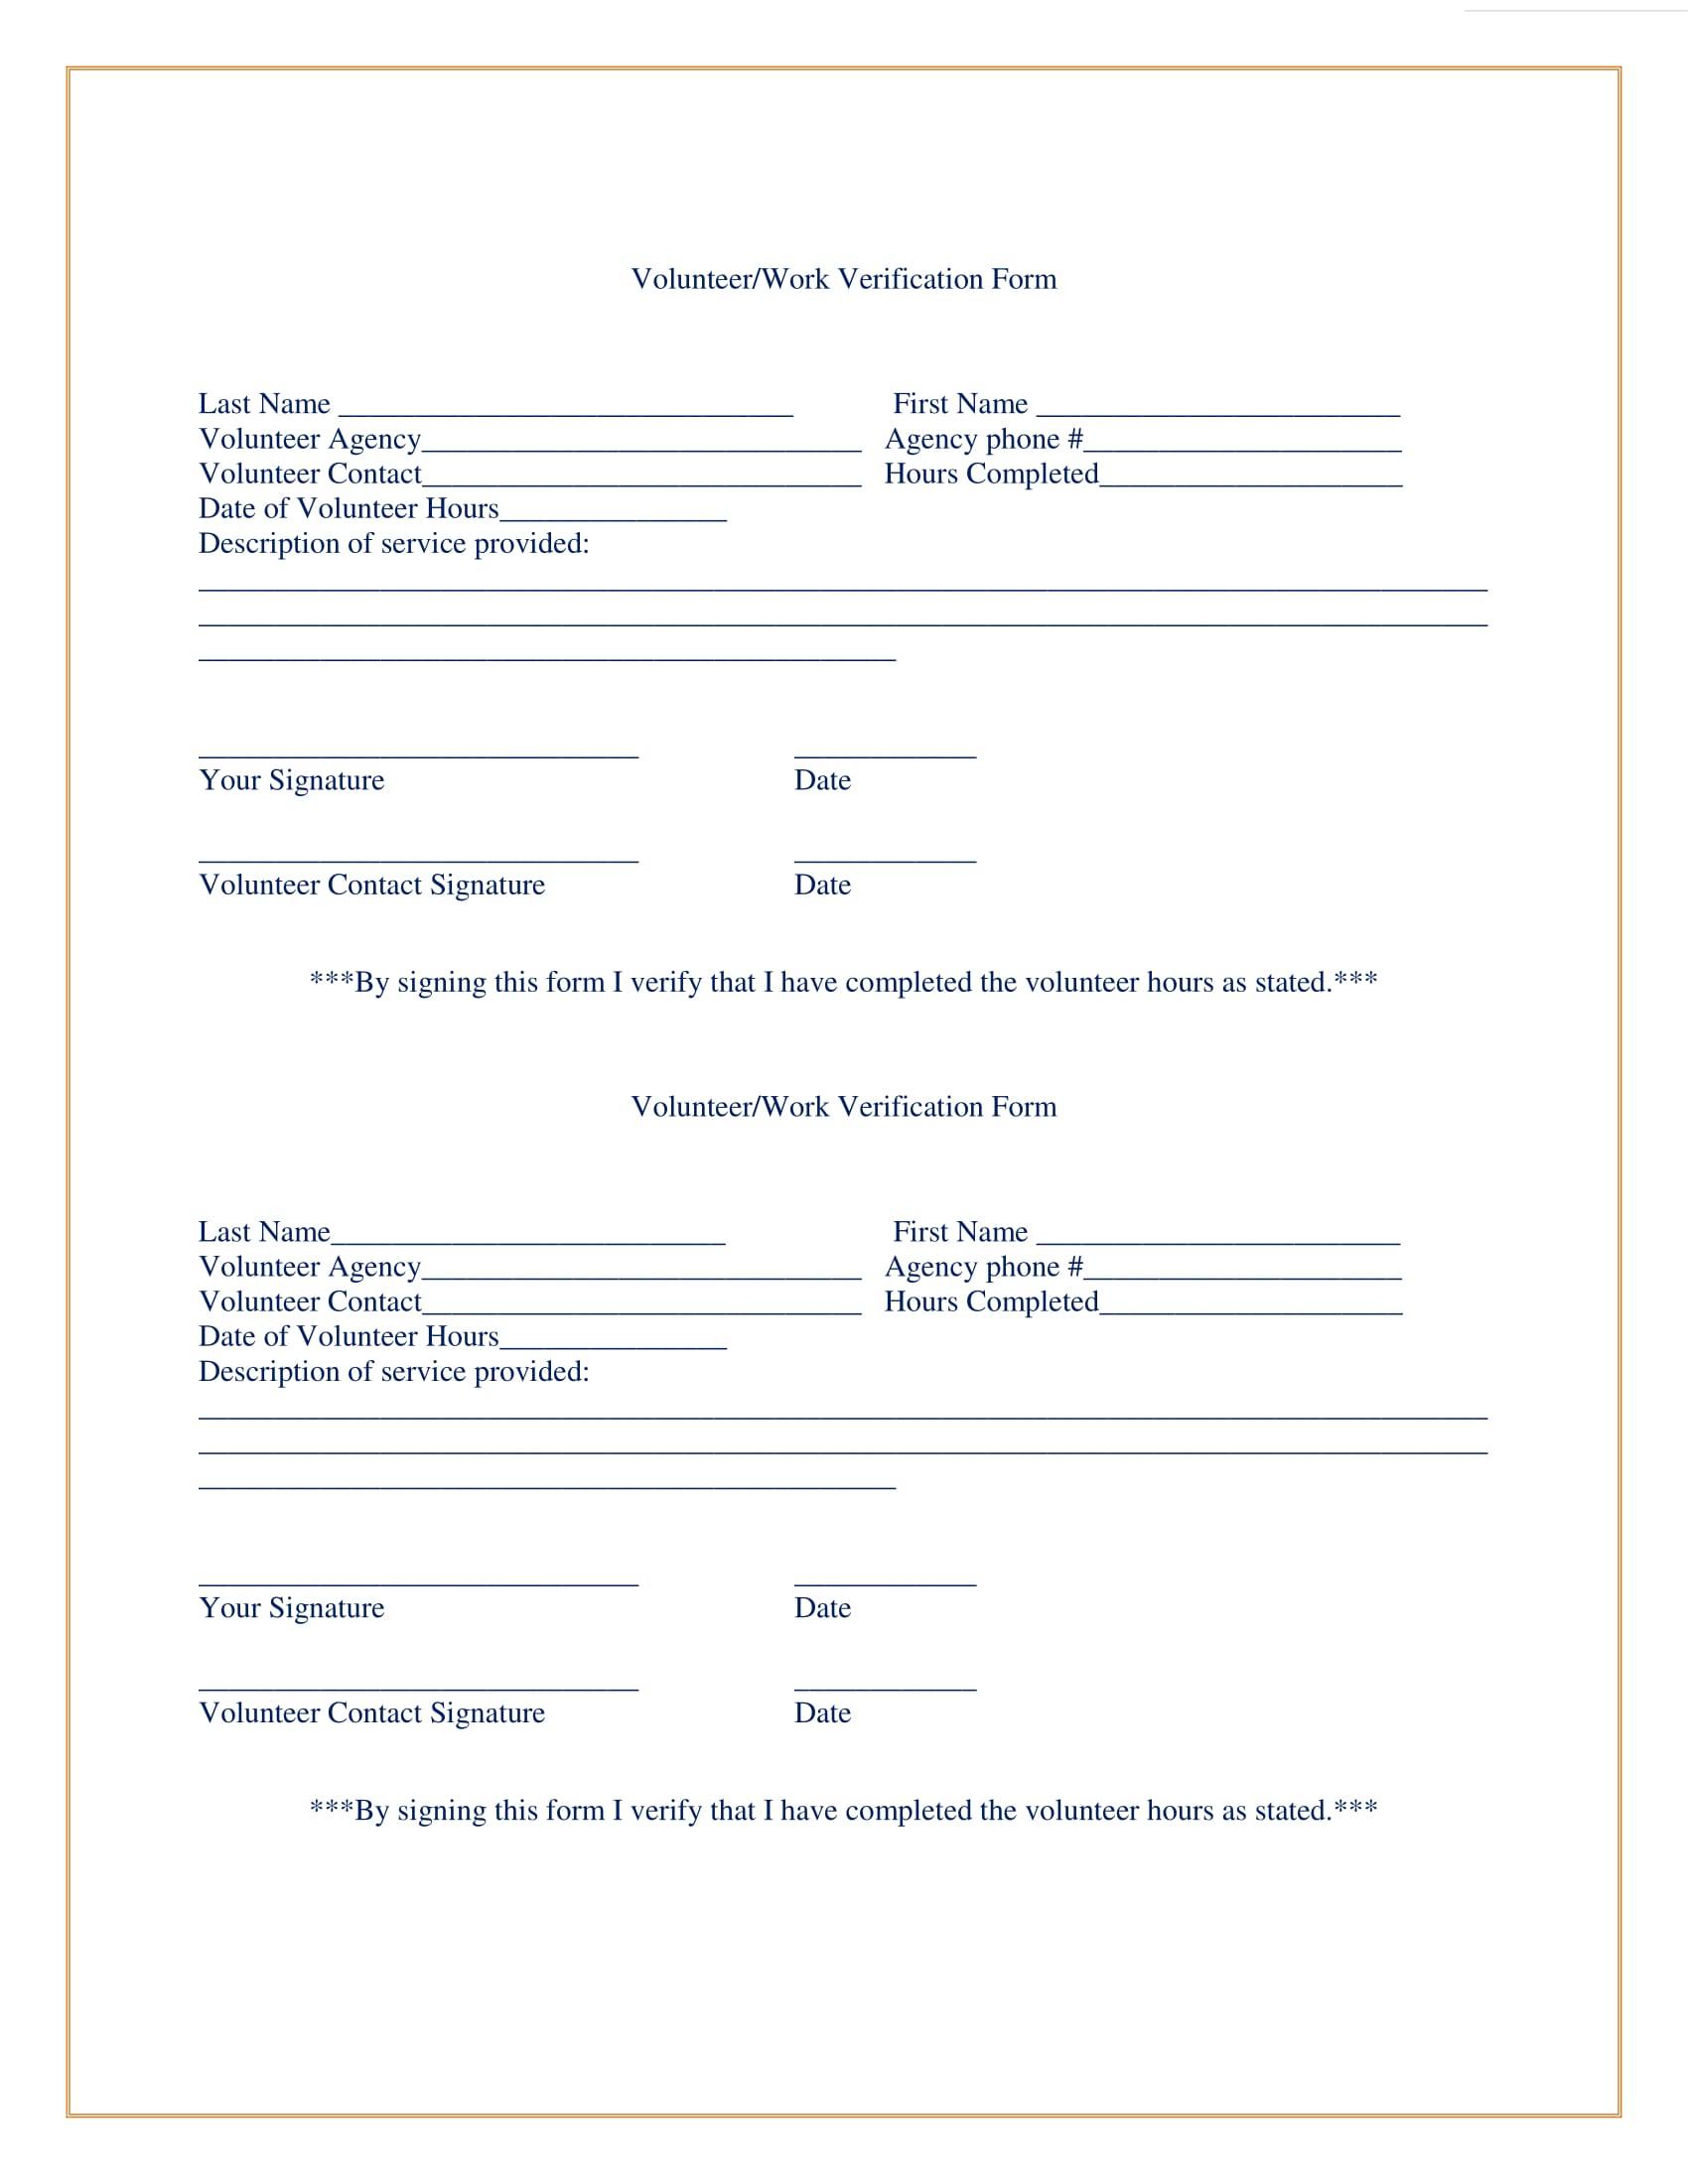 Verification Of Volunteer Hours Letter from images.sampleforms.com